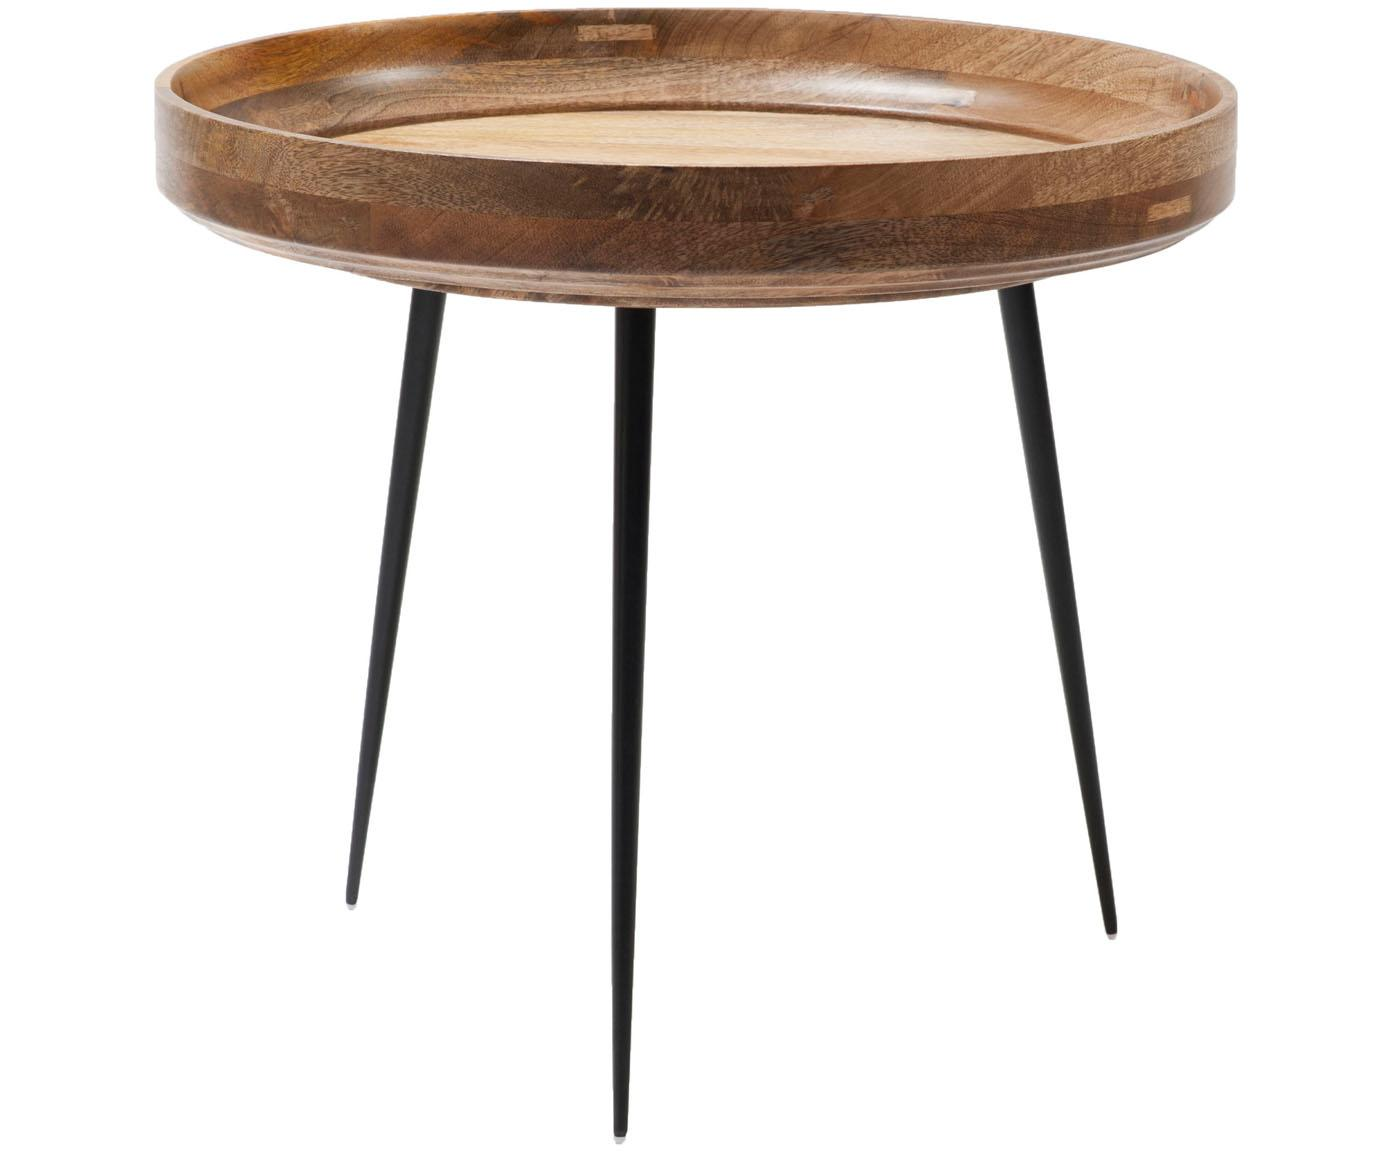 Kleine design bijzettafel Bowl Table van mangohout, Tafelblad: gelakt mangohout, Poten: gepoedercoat staal, Mangohoutkleurig, zwart, Ø 53 x H 46 cm